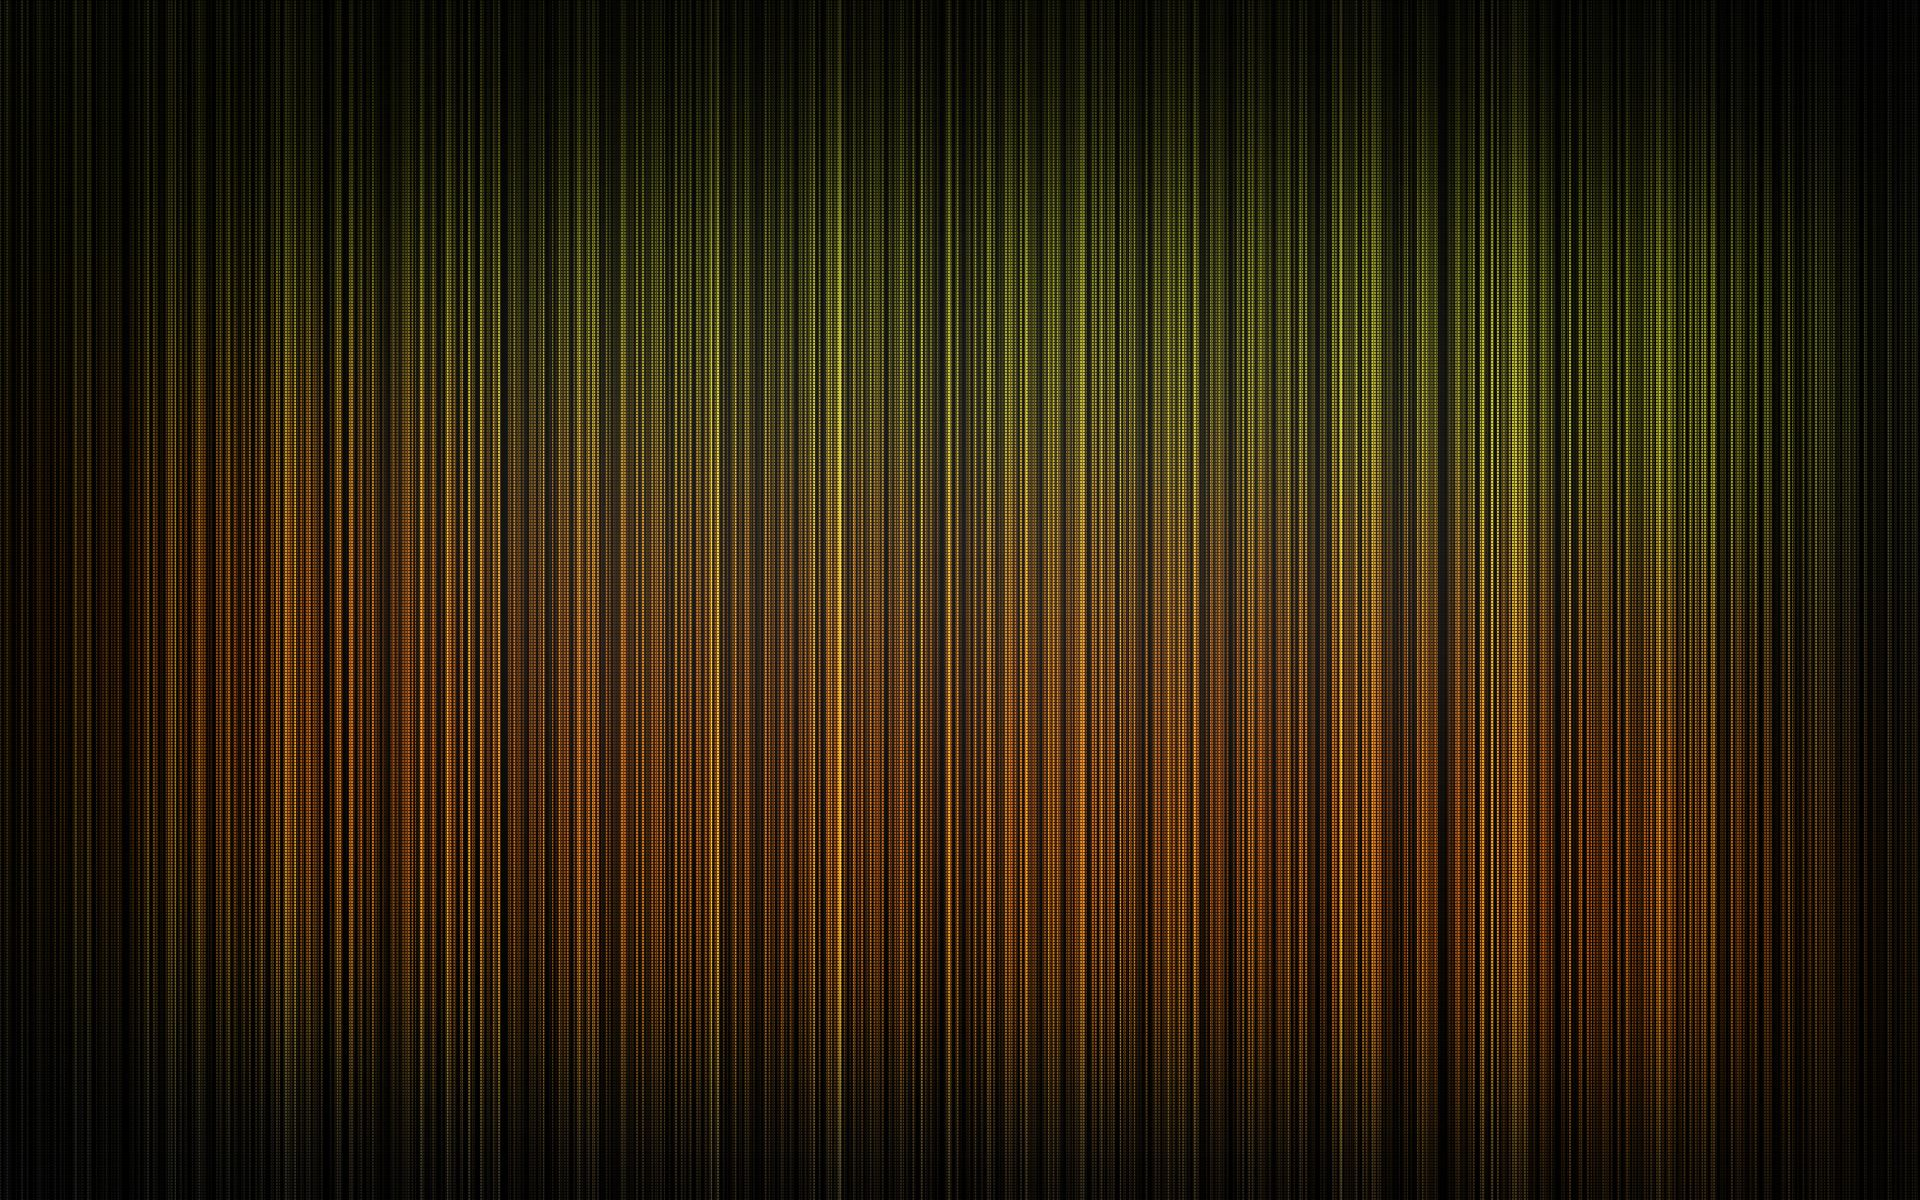 Yellow Texture Elegant Wallpaper Hd Free Desktop Mobile